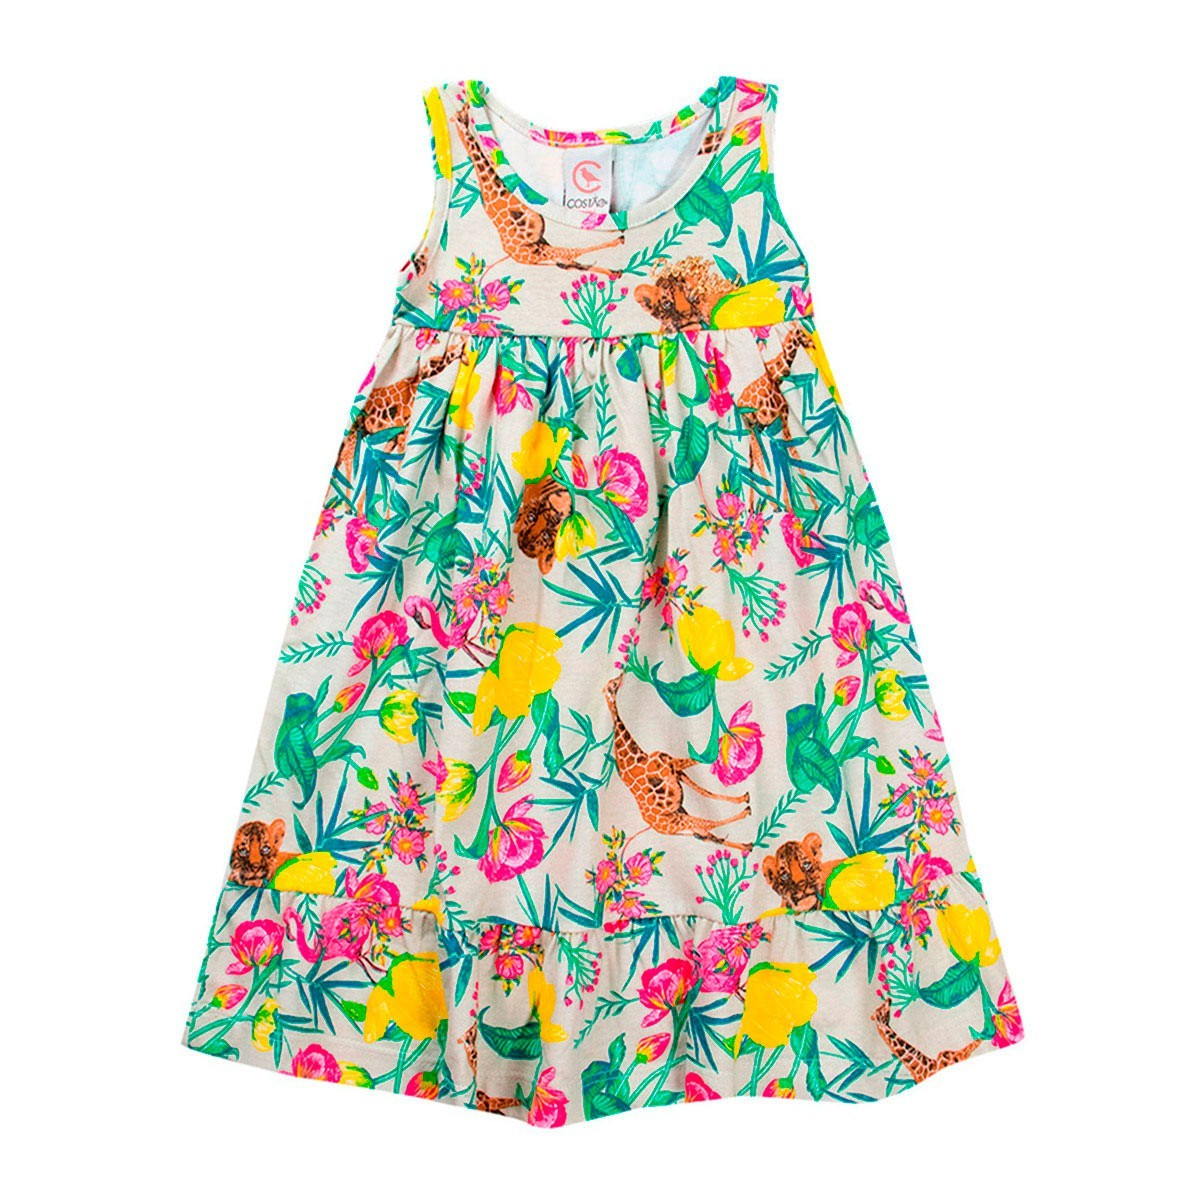 Vestido Infantil Feminino Bichos Rosa Bege - Costão Mini